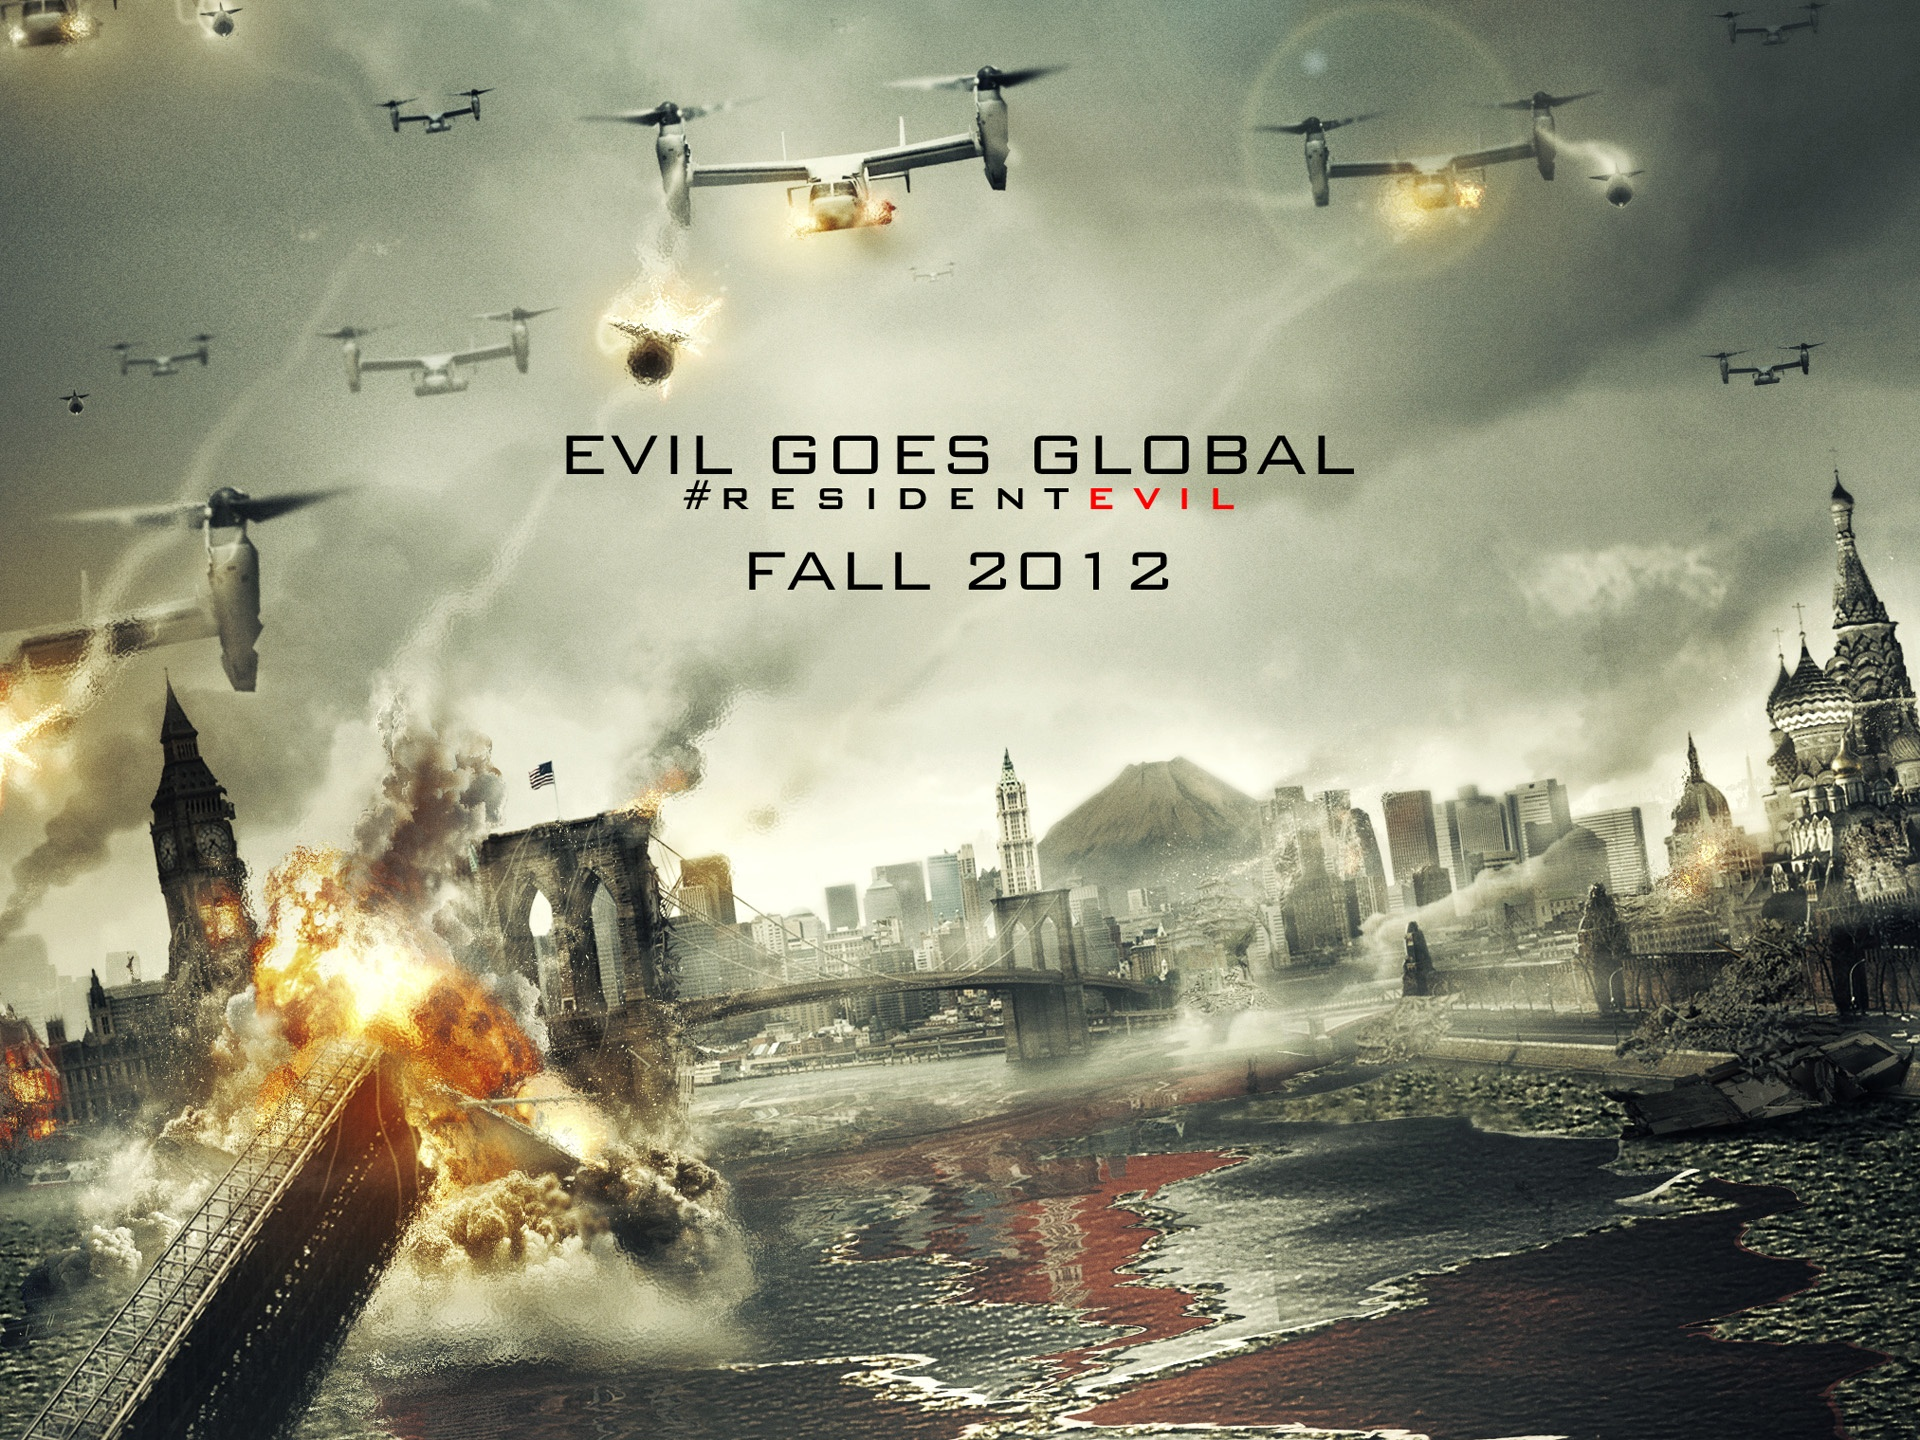 Nuevas Imagenes de Resident Evil 5: Retribution (2012)